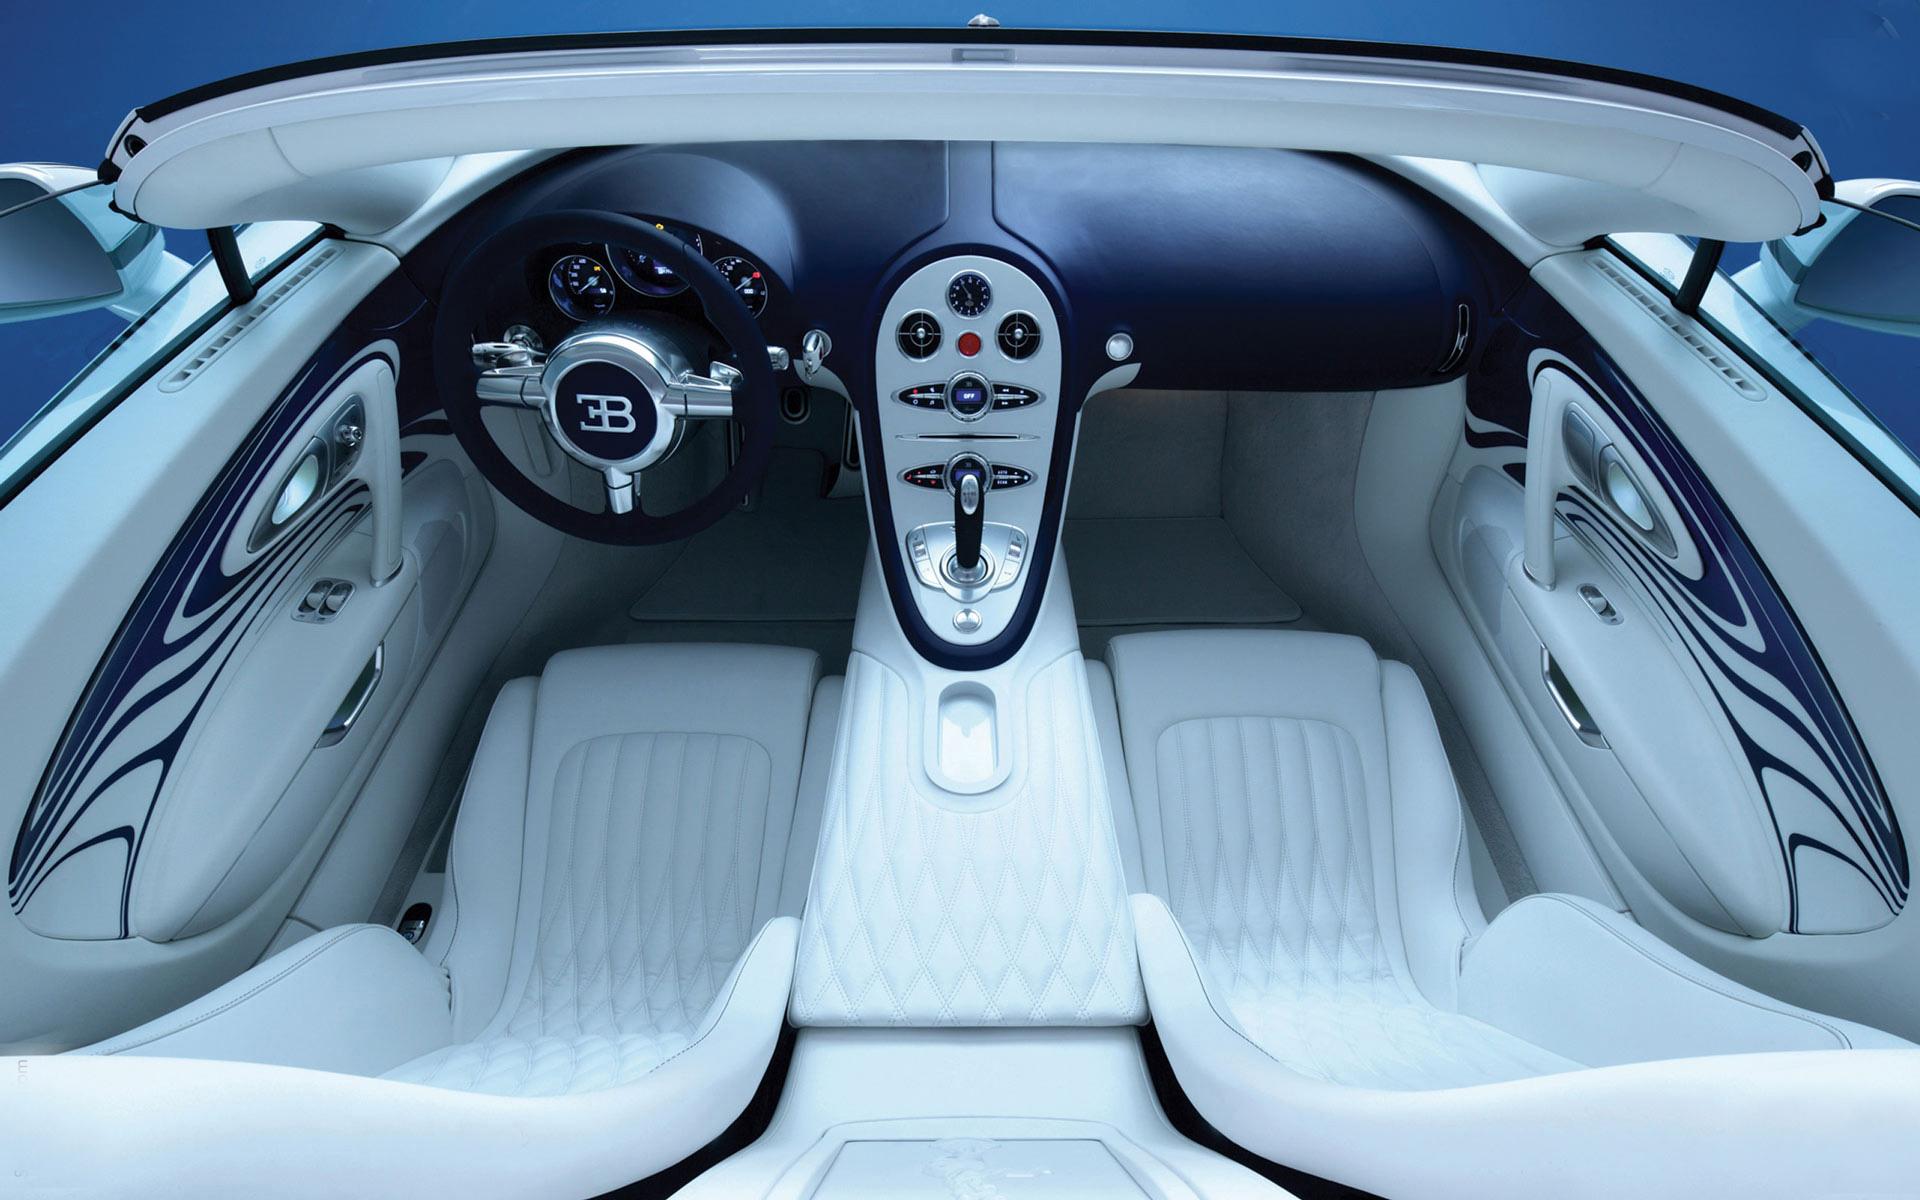 Bugatti-Veyron-Grand-Sport-Vitesse-Interior-Photo Extraordinary Bugatti Veyron Grand Sport Vitesse Cars Trend